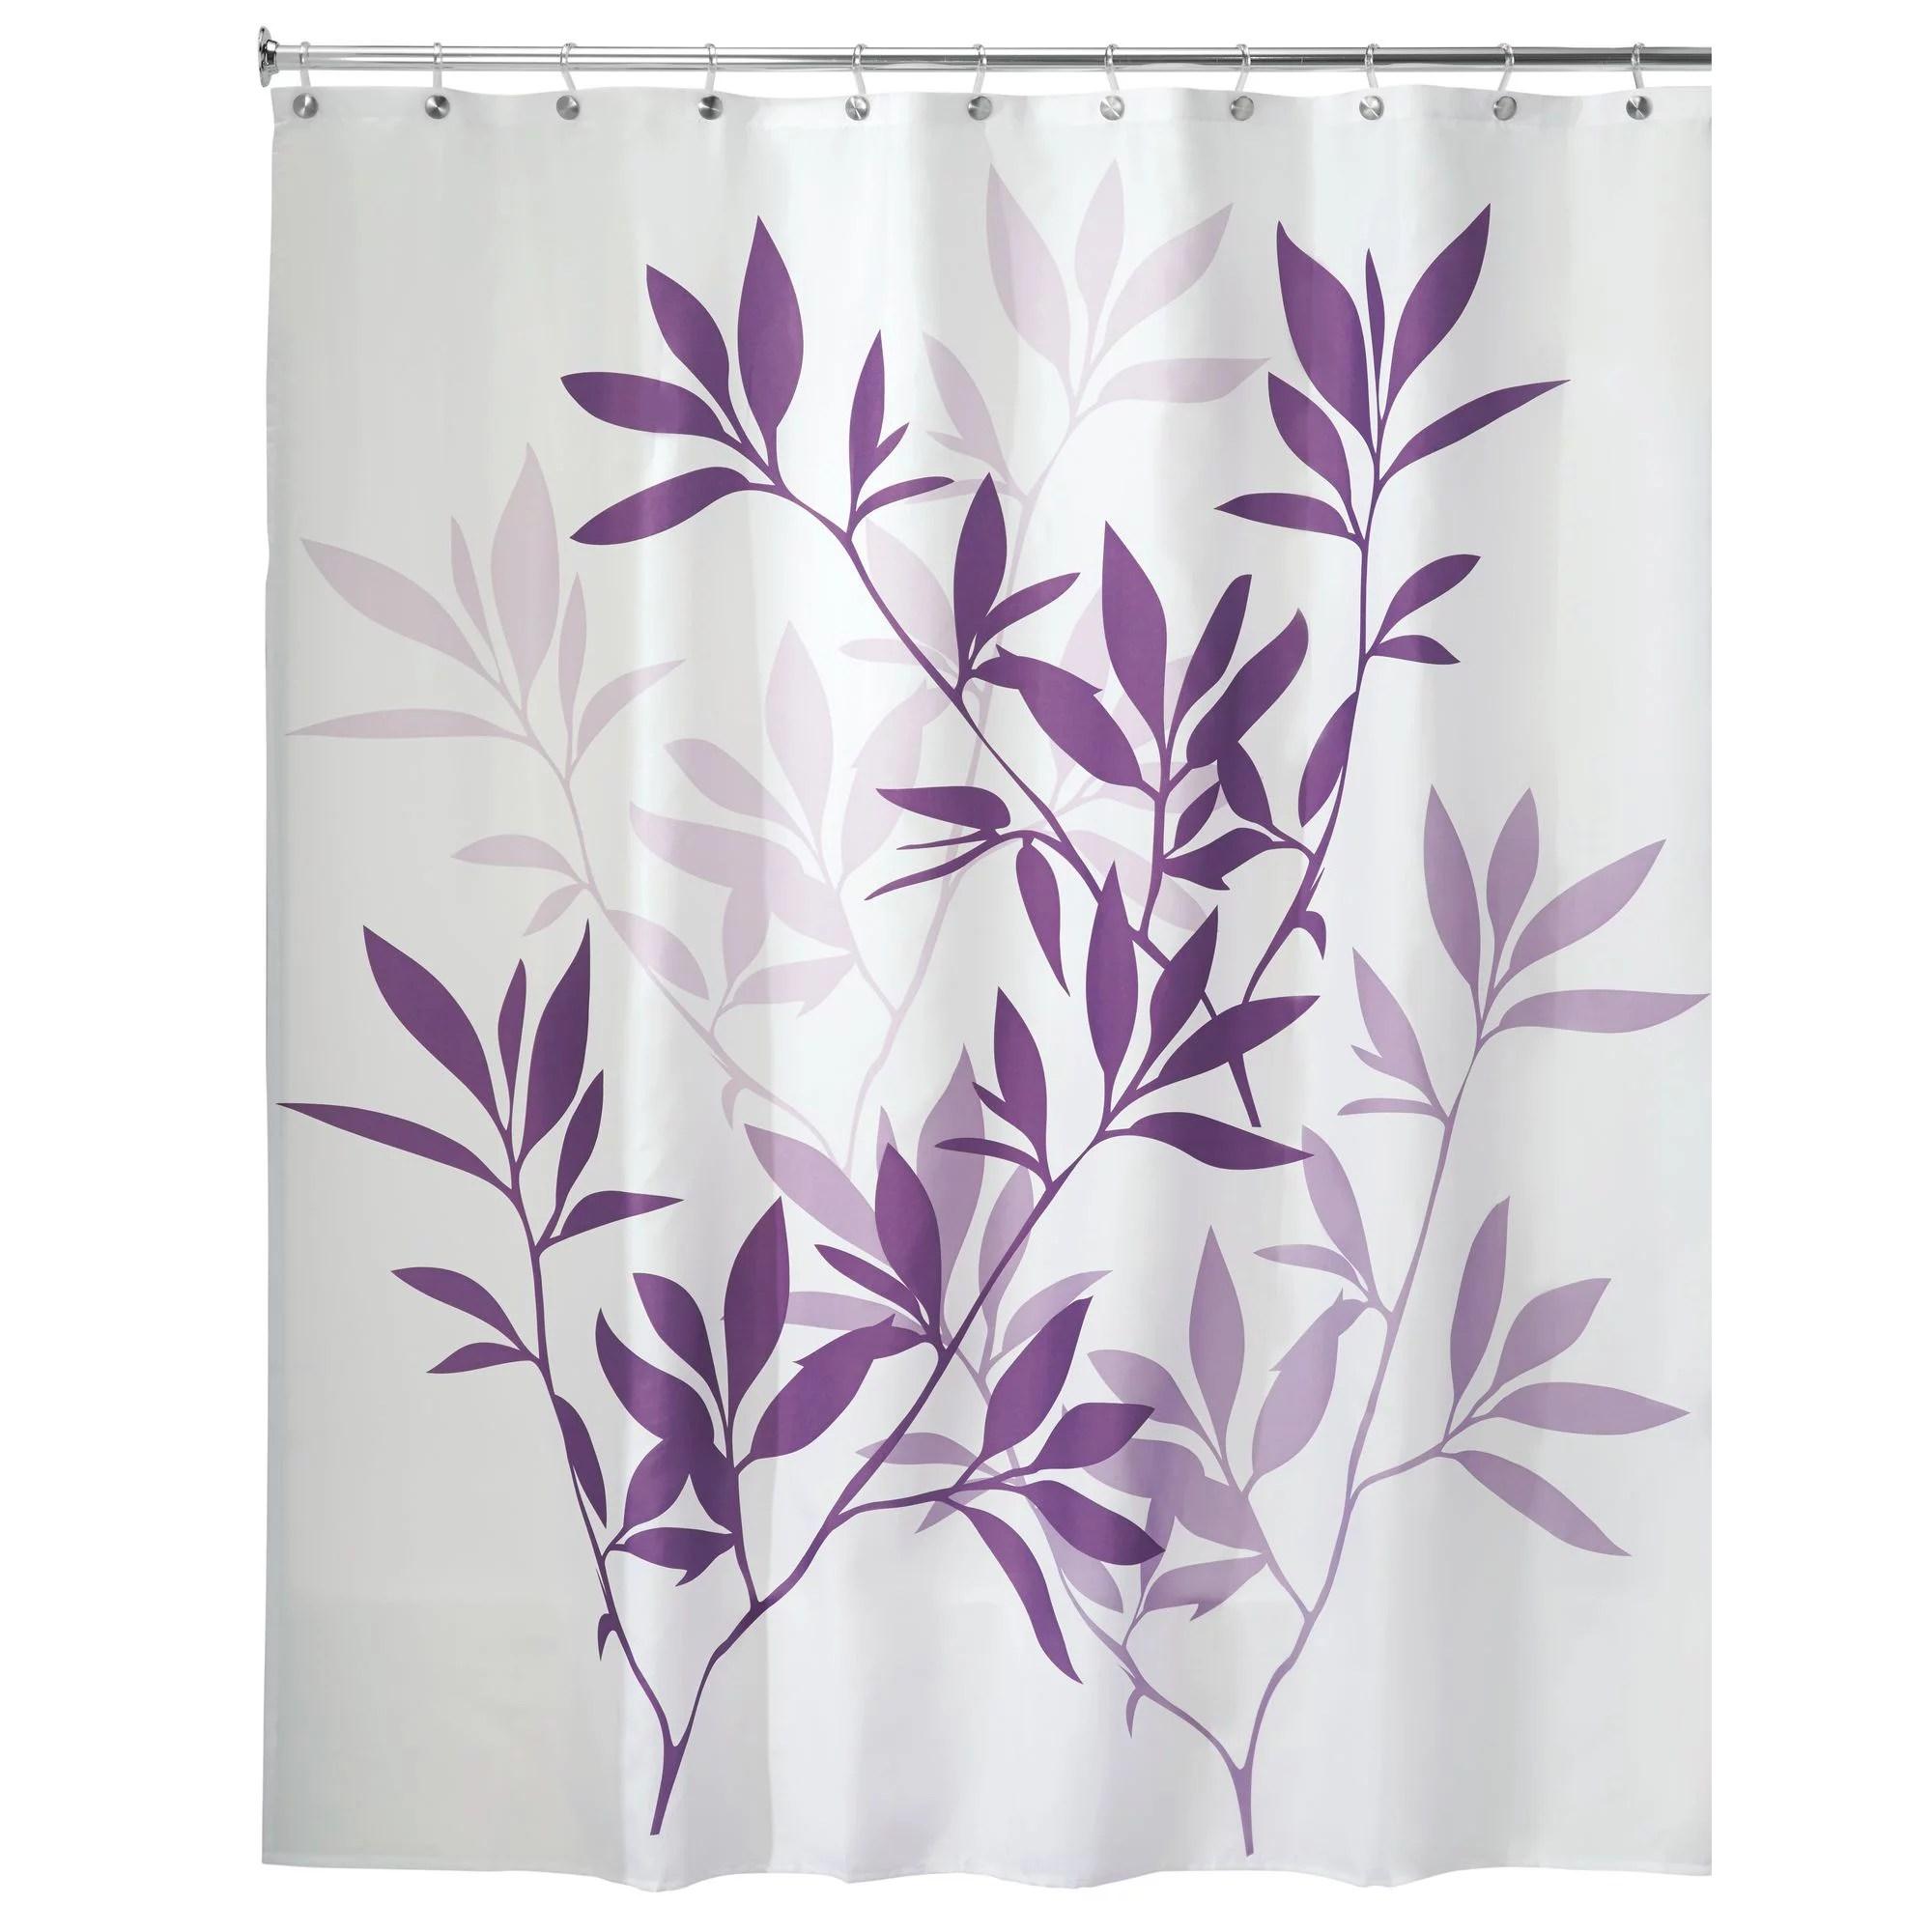 https www walmart com browse home shower curtains purple 4044 539095 533461 y29sb3i6uhvycgxl